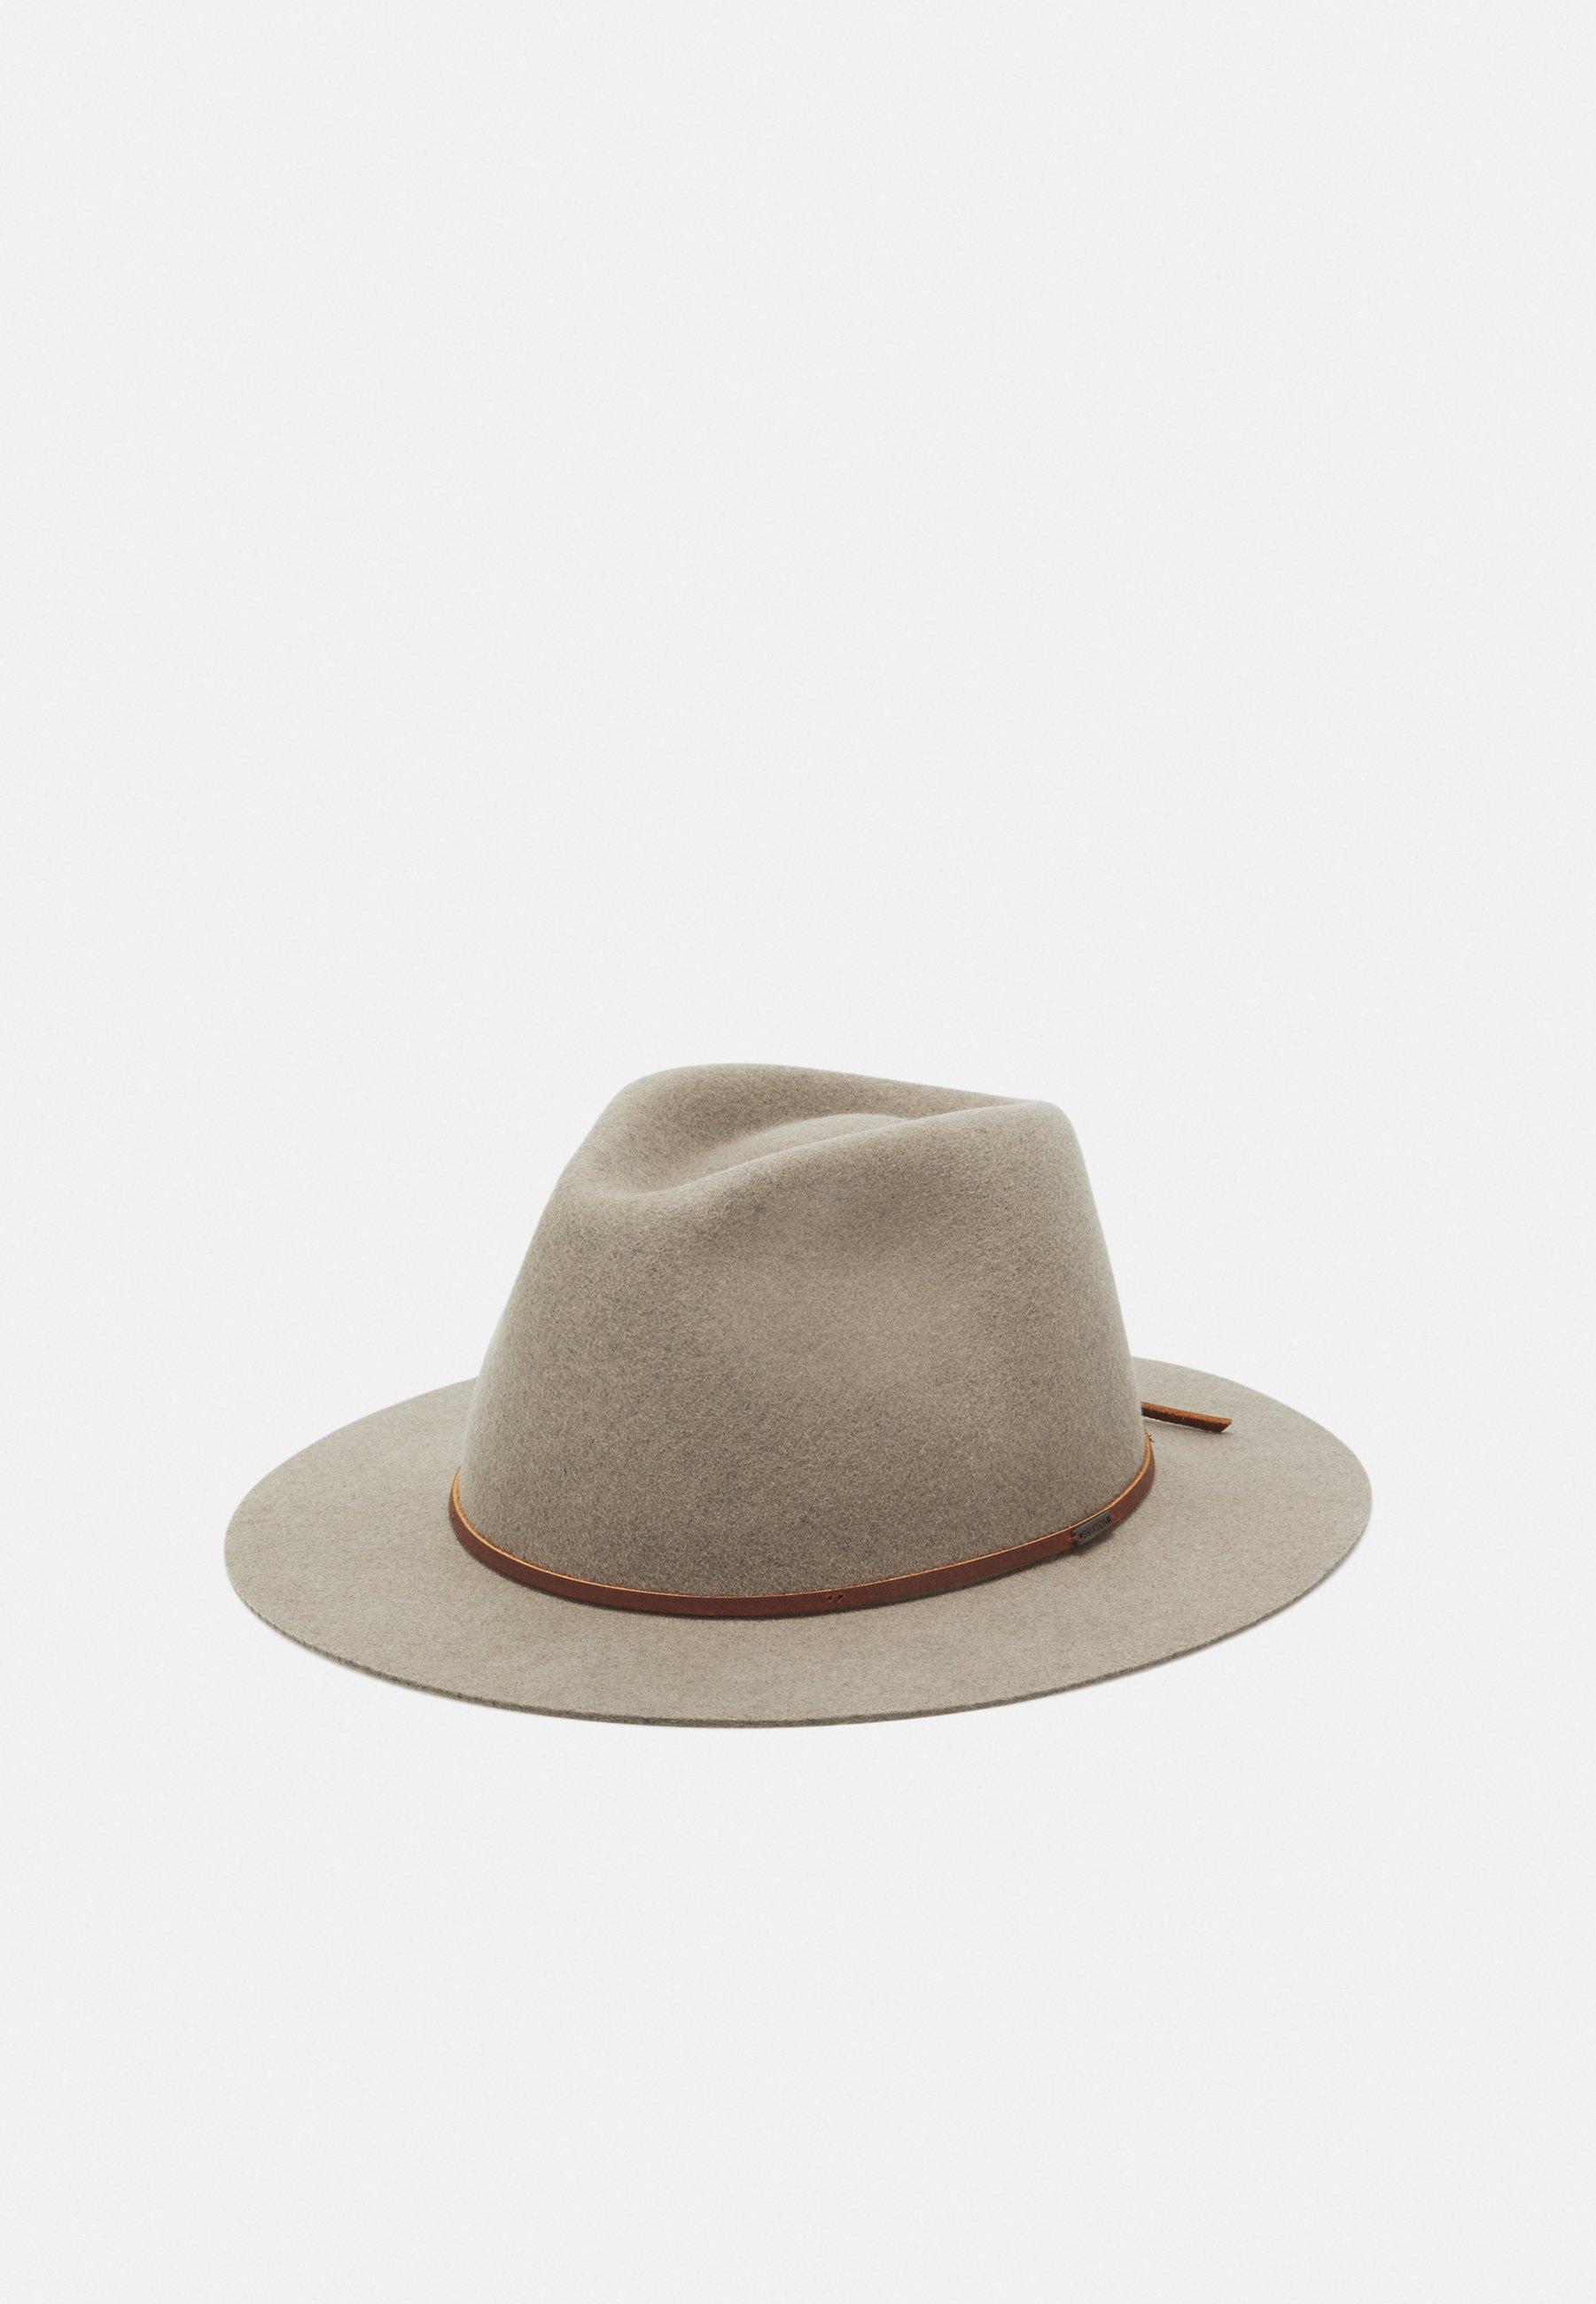 Homme WESLEY FEDORA UNISEX - Chapeau